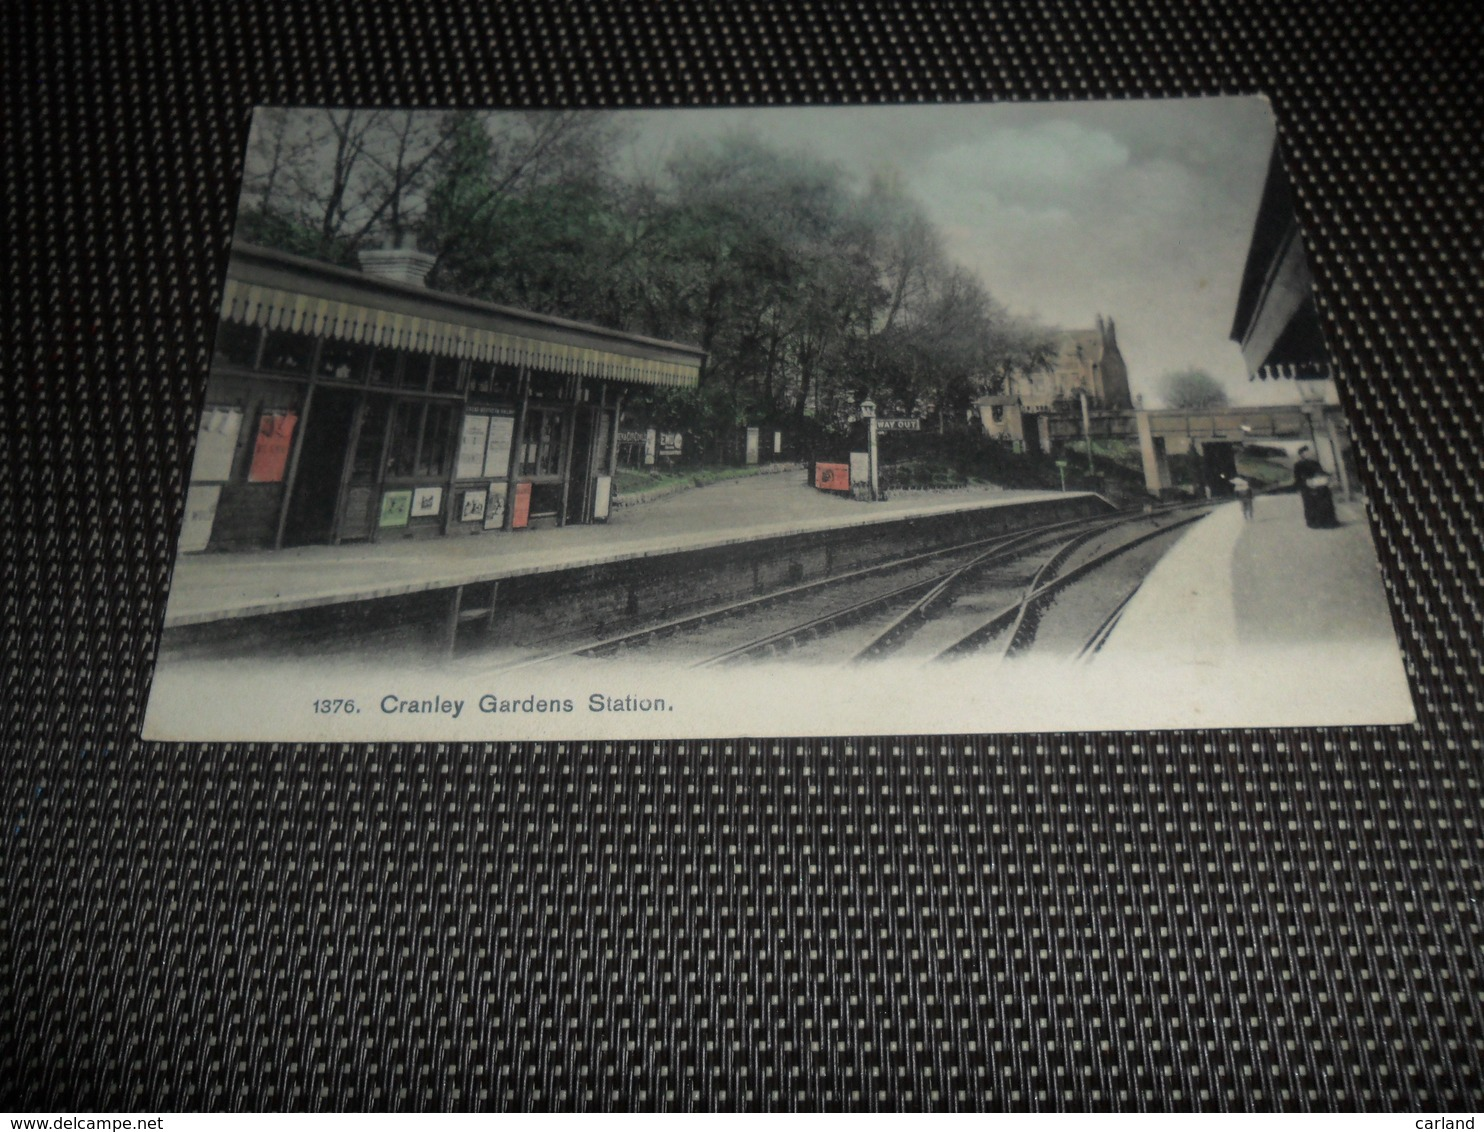 Engeland ( 8 )  England  United Kingdom  Verenigd - Koninkrijk  :  Cranley Gardens Station - Angleterre